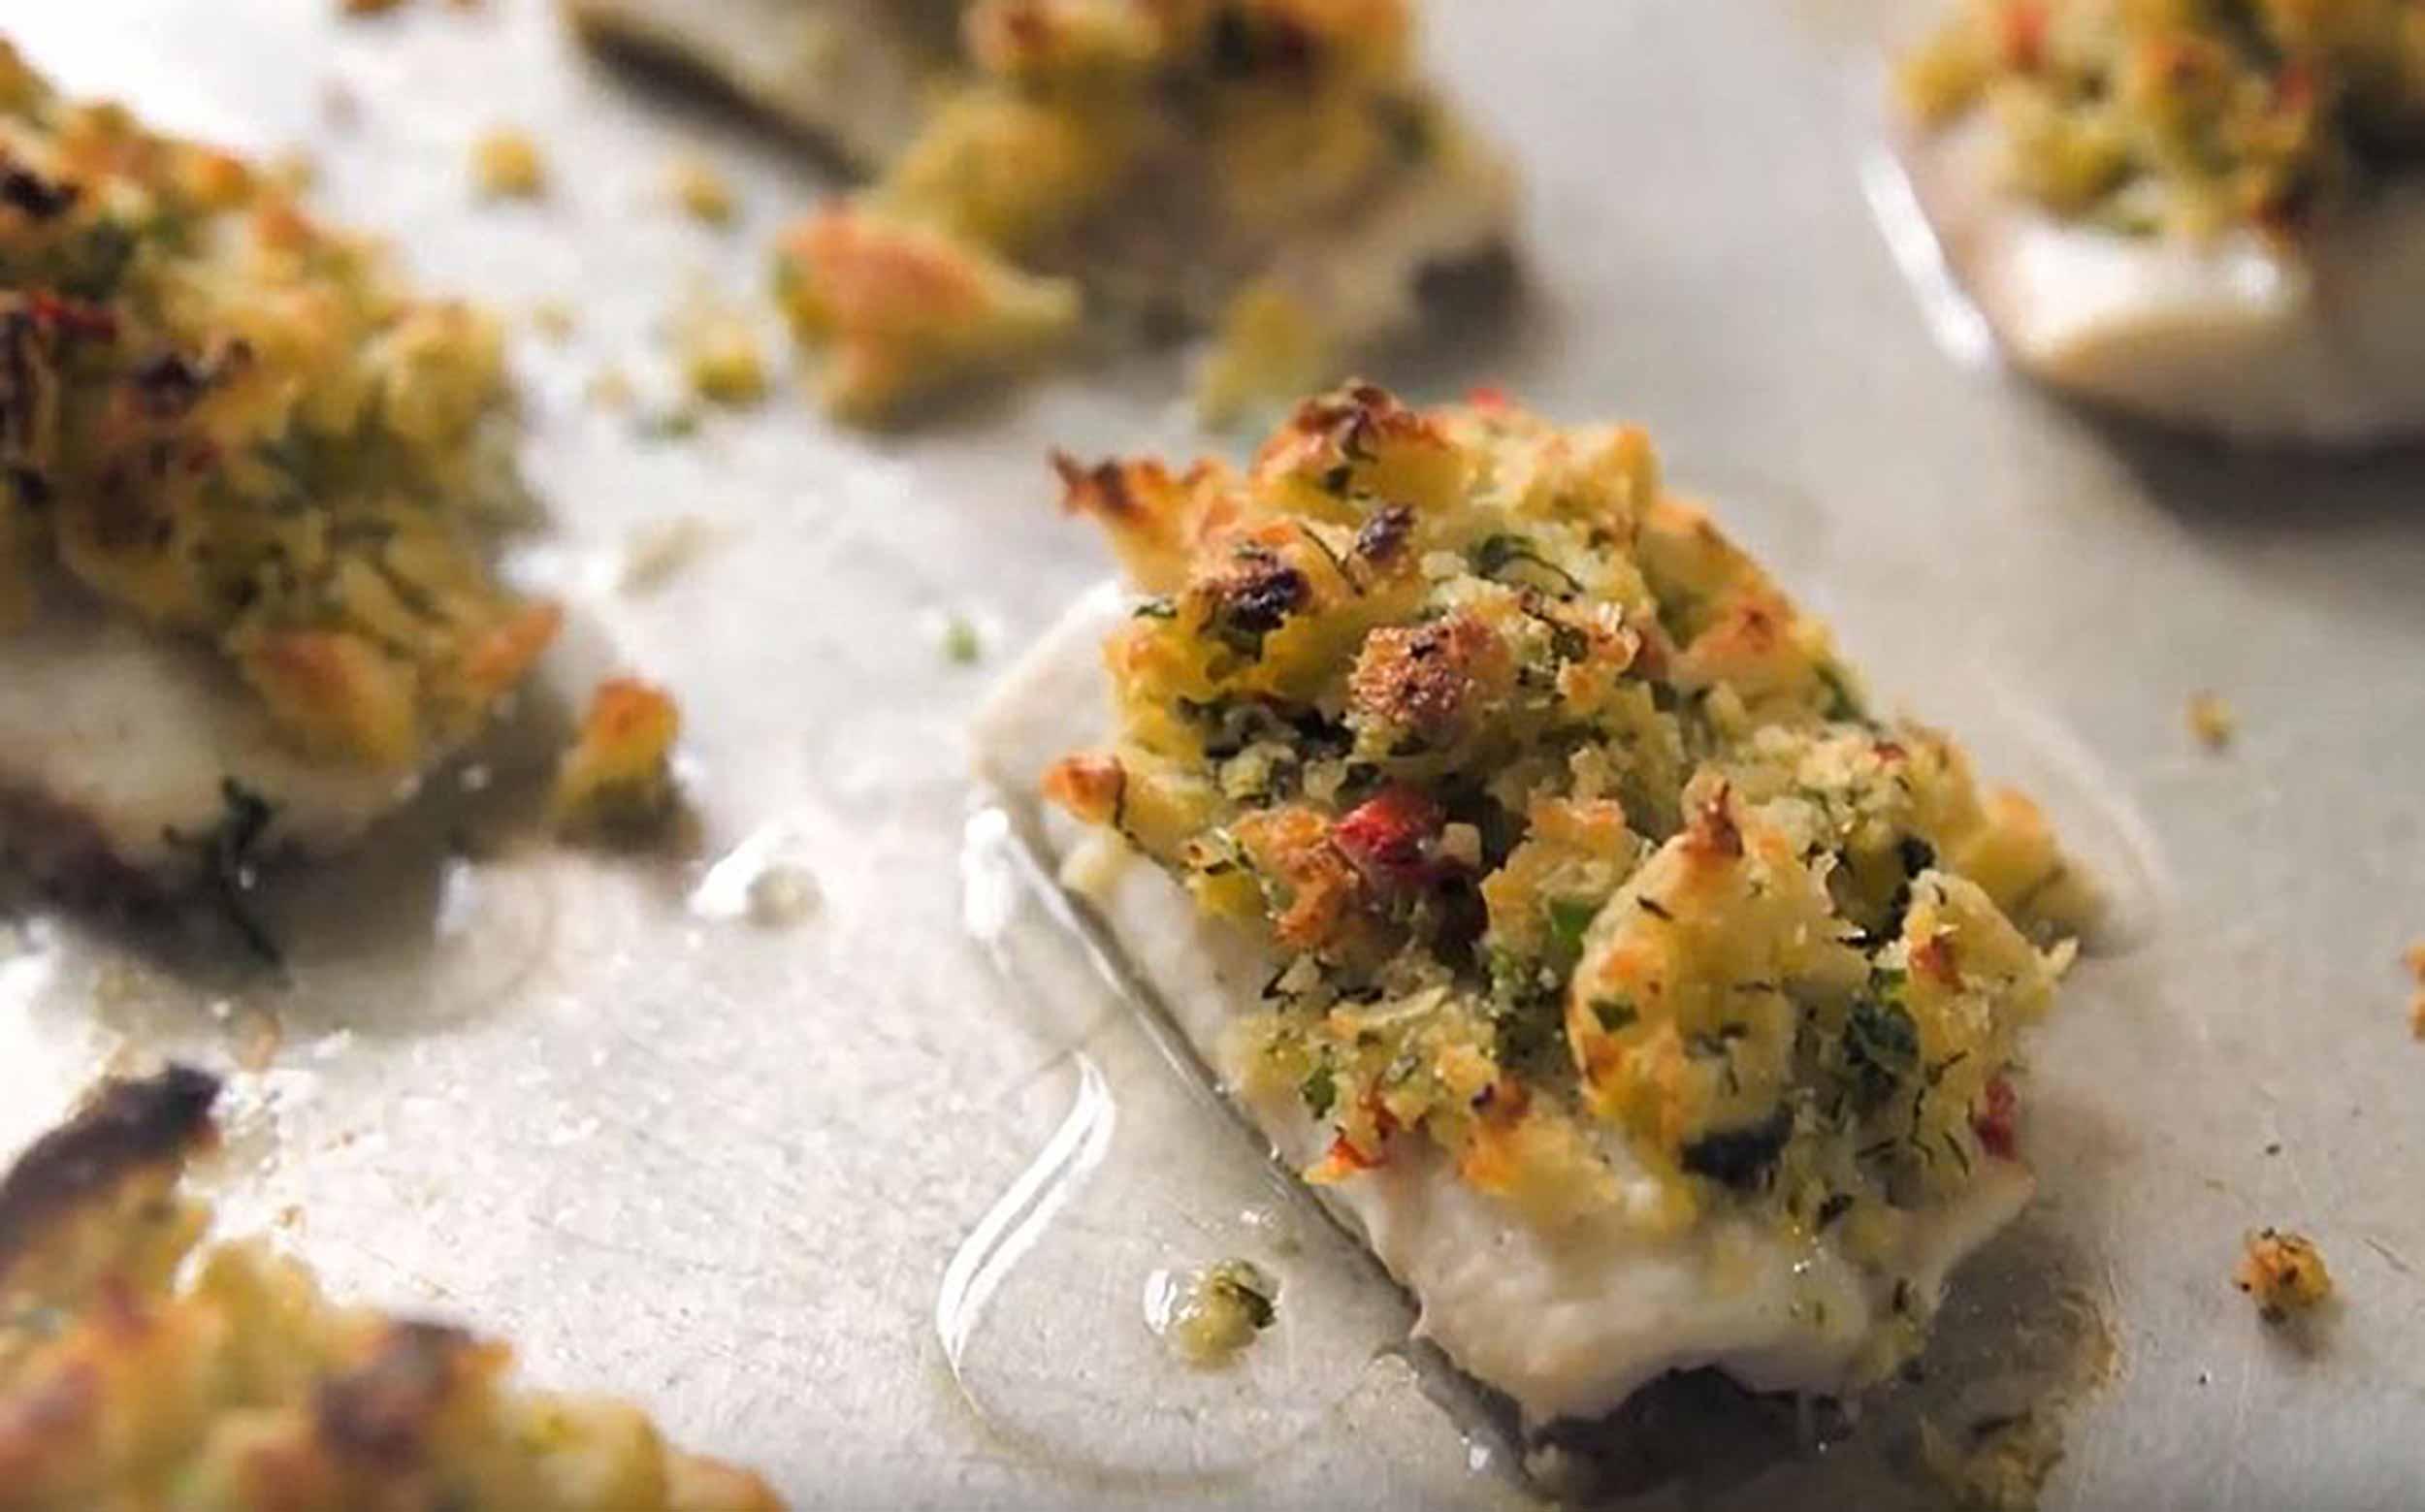 Al Brown's fresh baked fish recipe